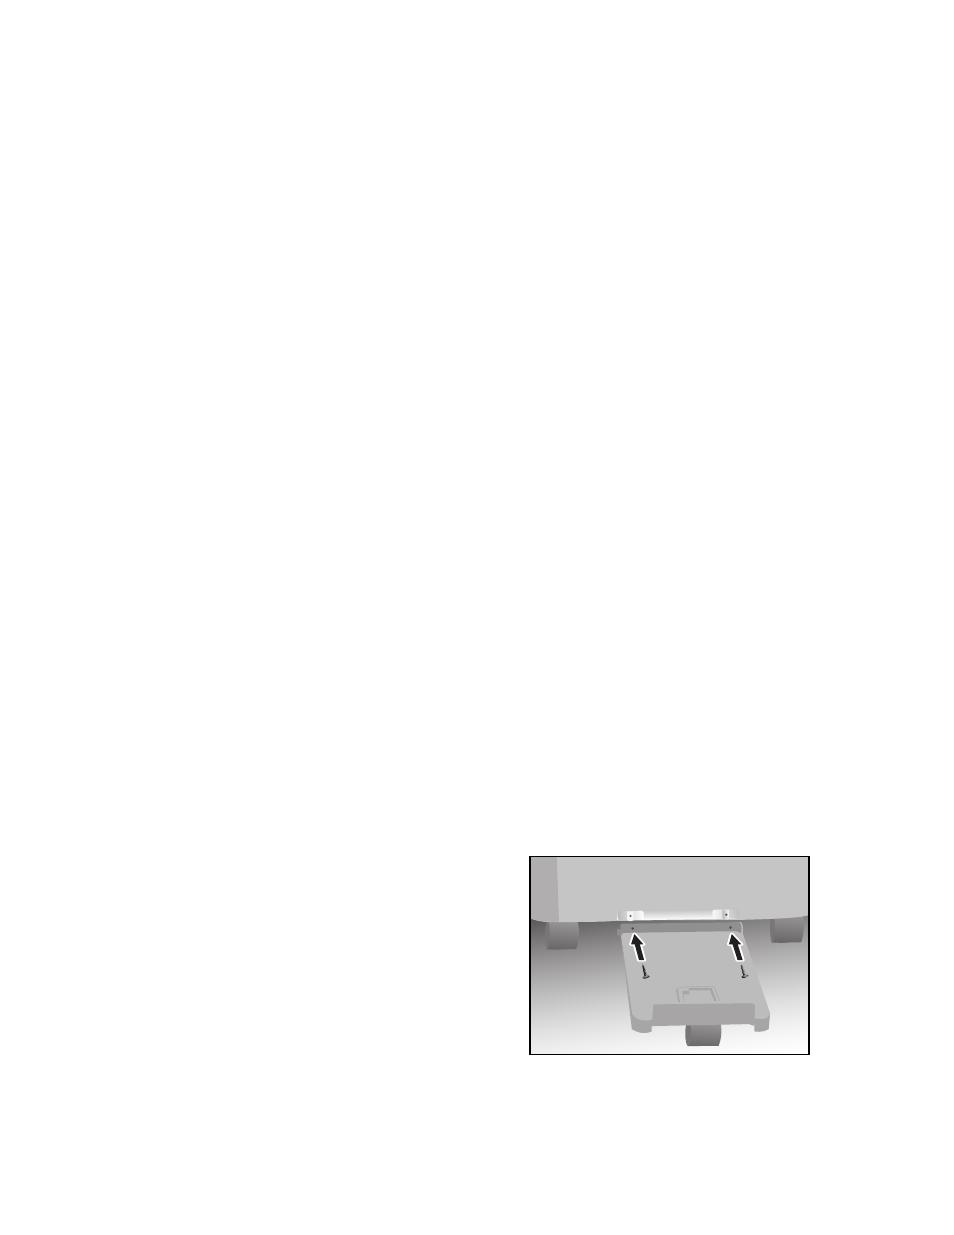 Danby dufm085a2wp1 user manual | page 2 / 23 | original mode.